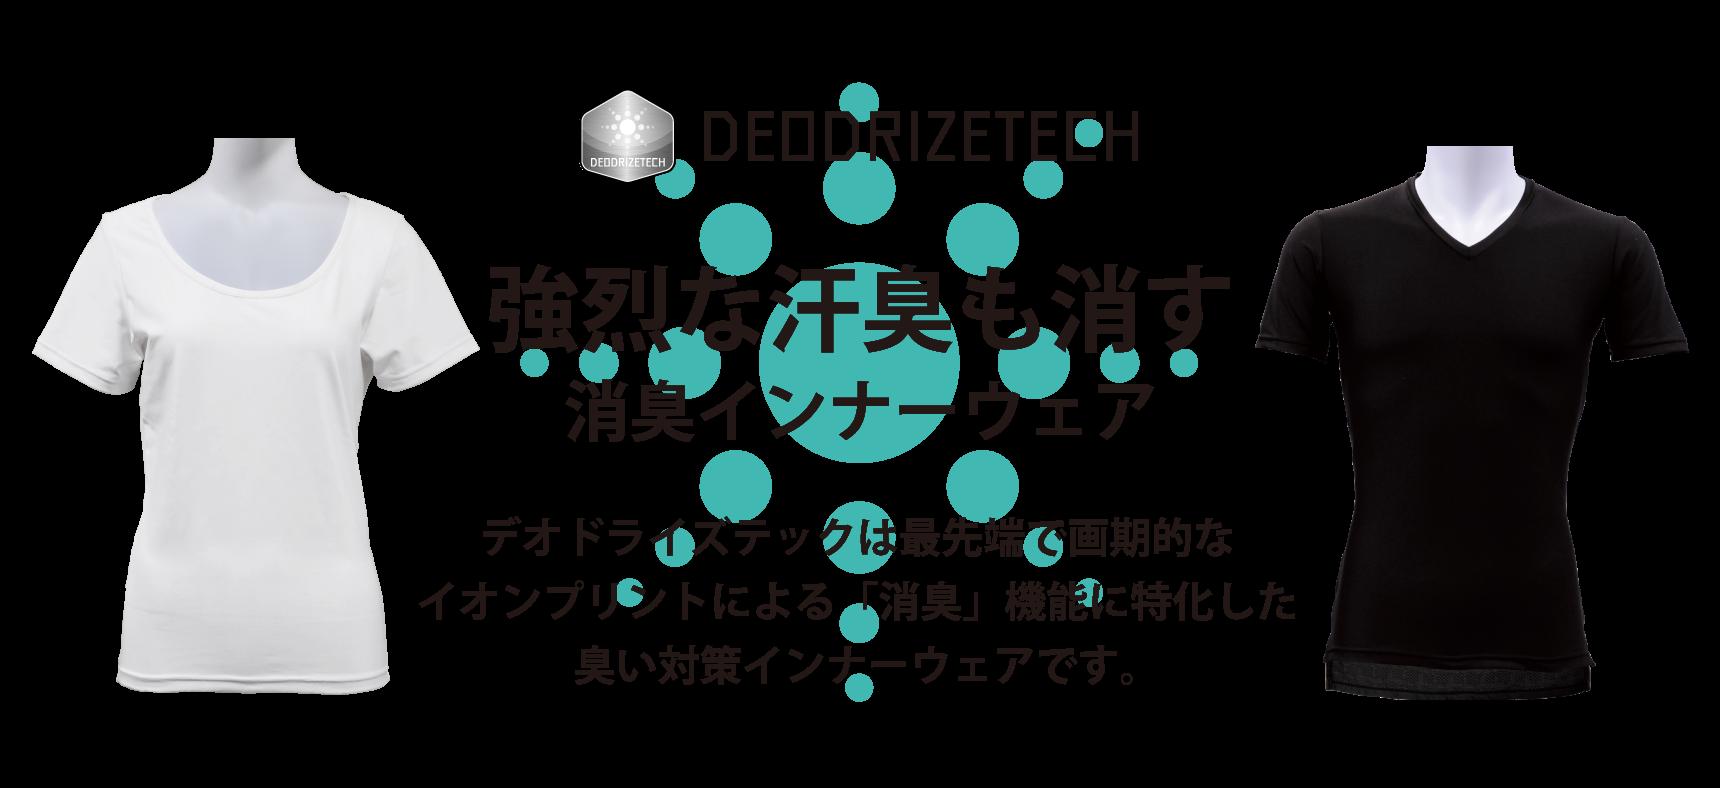 DEODRIZETECH 強烈な汗臭も消す消臭インナーウェア デオドライズテックは最先端で画期的なイオンプリントによる「消臭」機能に特化した臭い対策インナーウェアです。